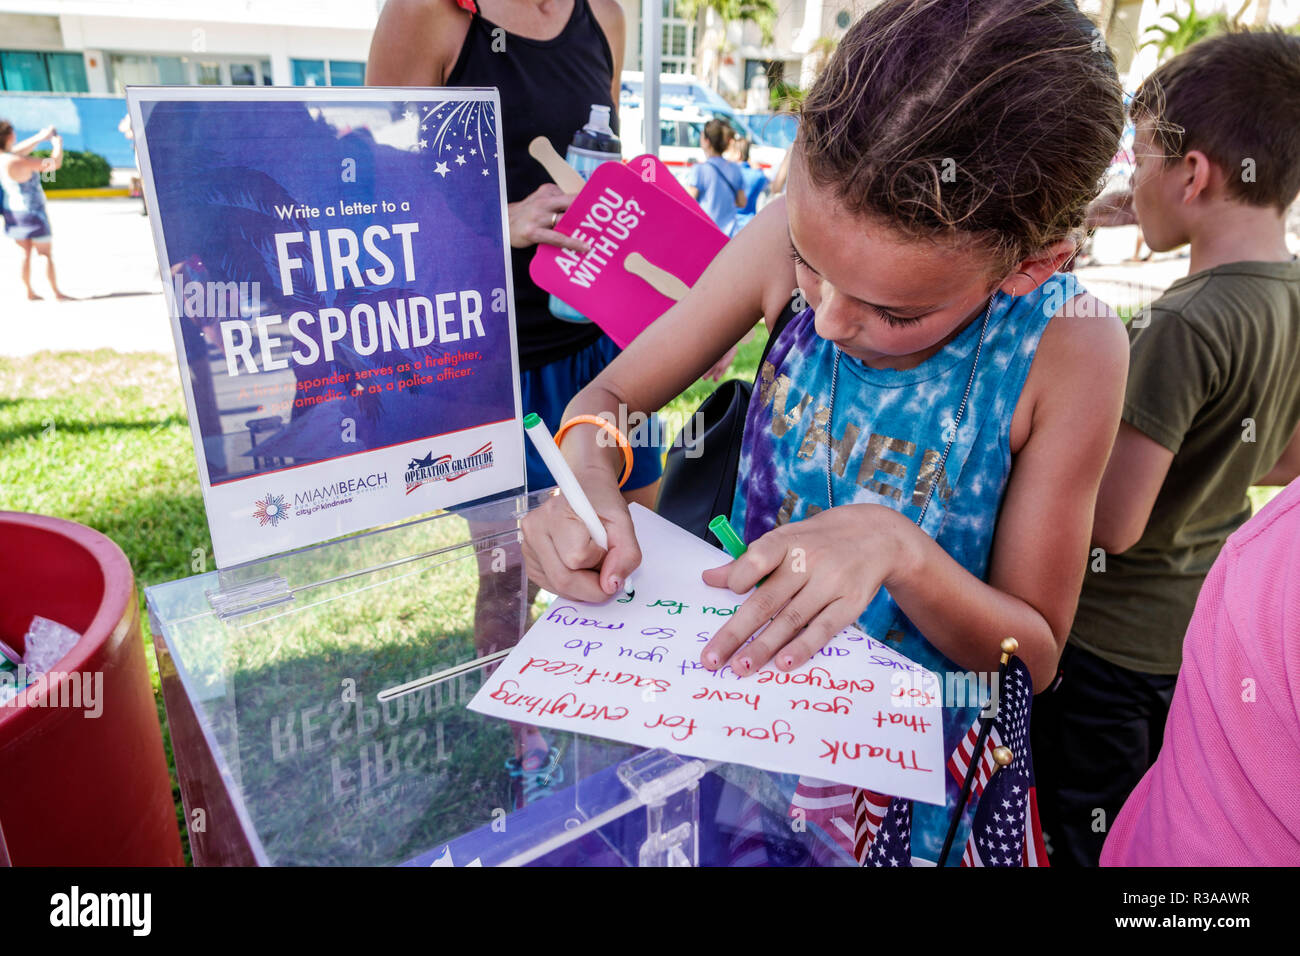 Miami Beach Florida Ocean Drive Veterans Day Parade activities write letter gratitude American heroes first responders girl writing - Stock Image